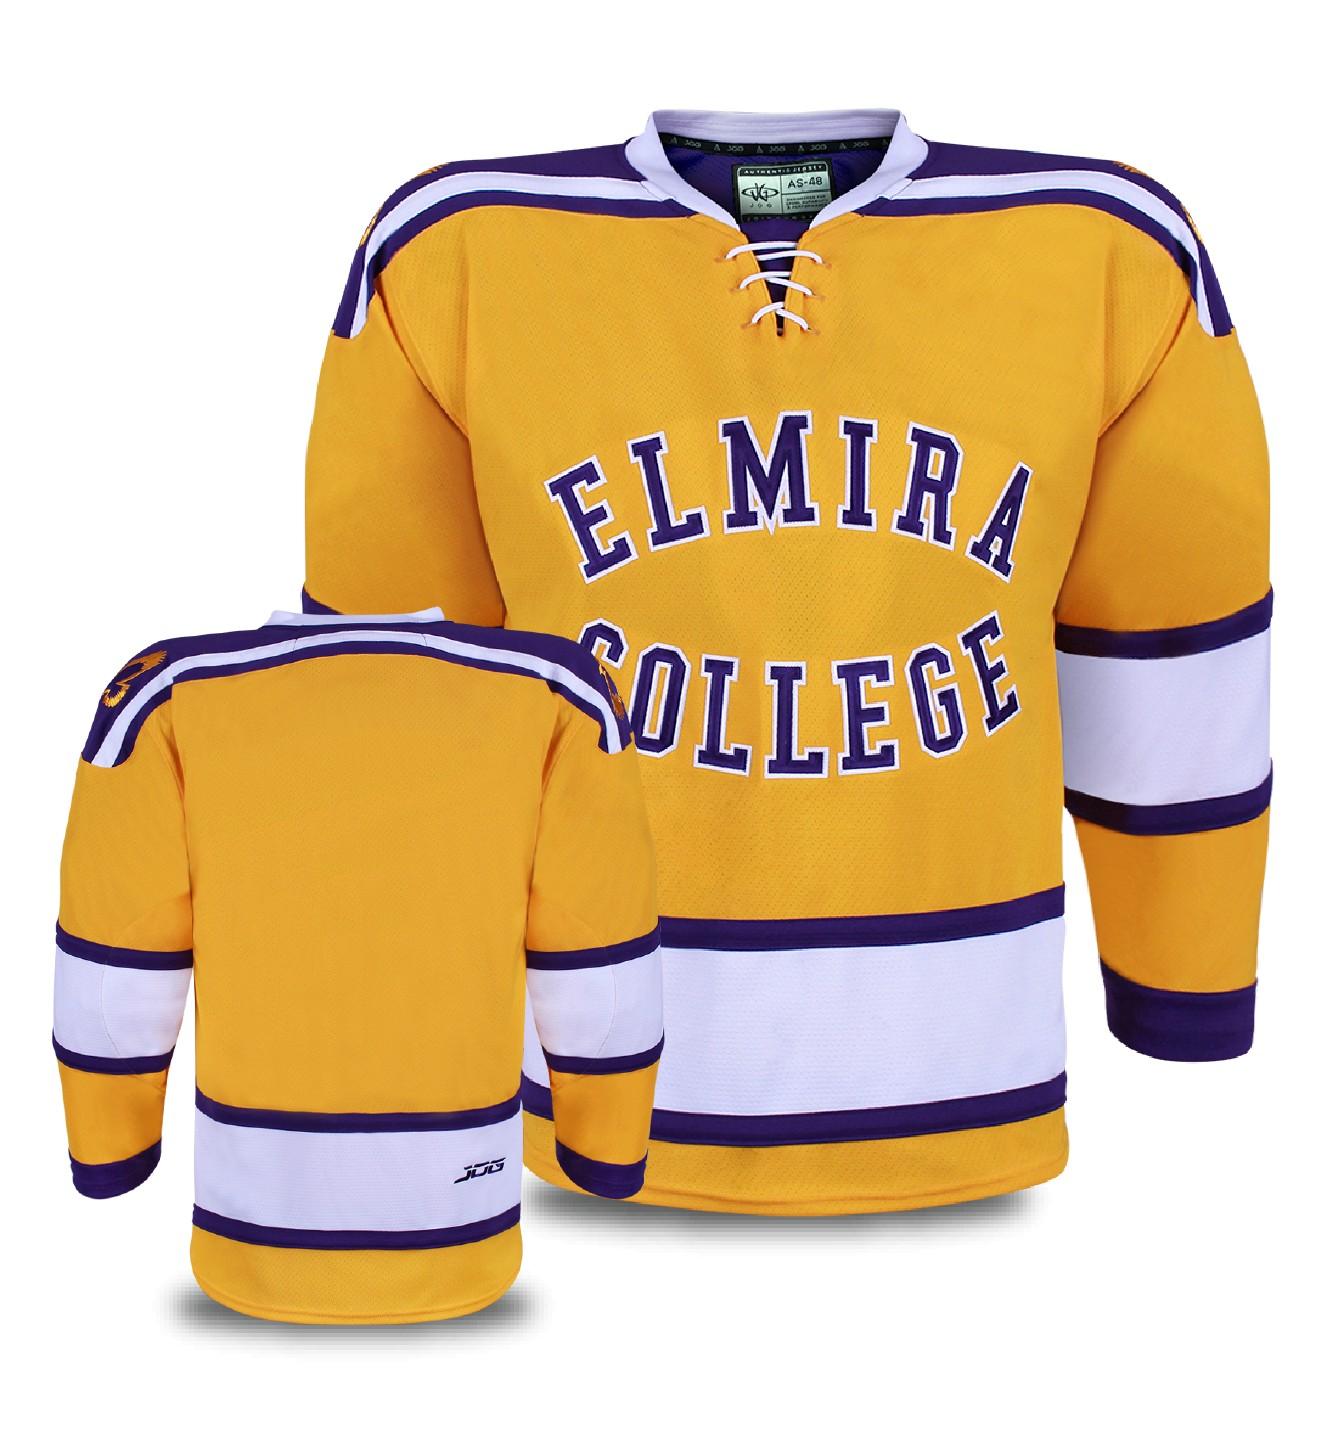 Custom hockey jersey for the men's and women's ice hockey teams. NHL jersey quality ice hockey jersey.